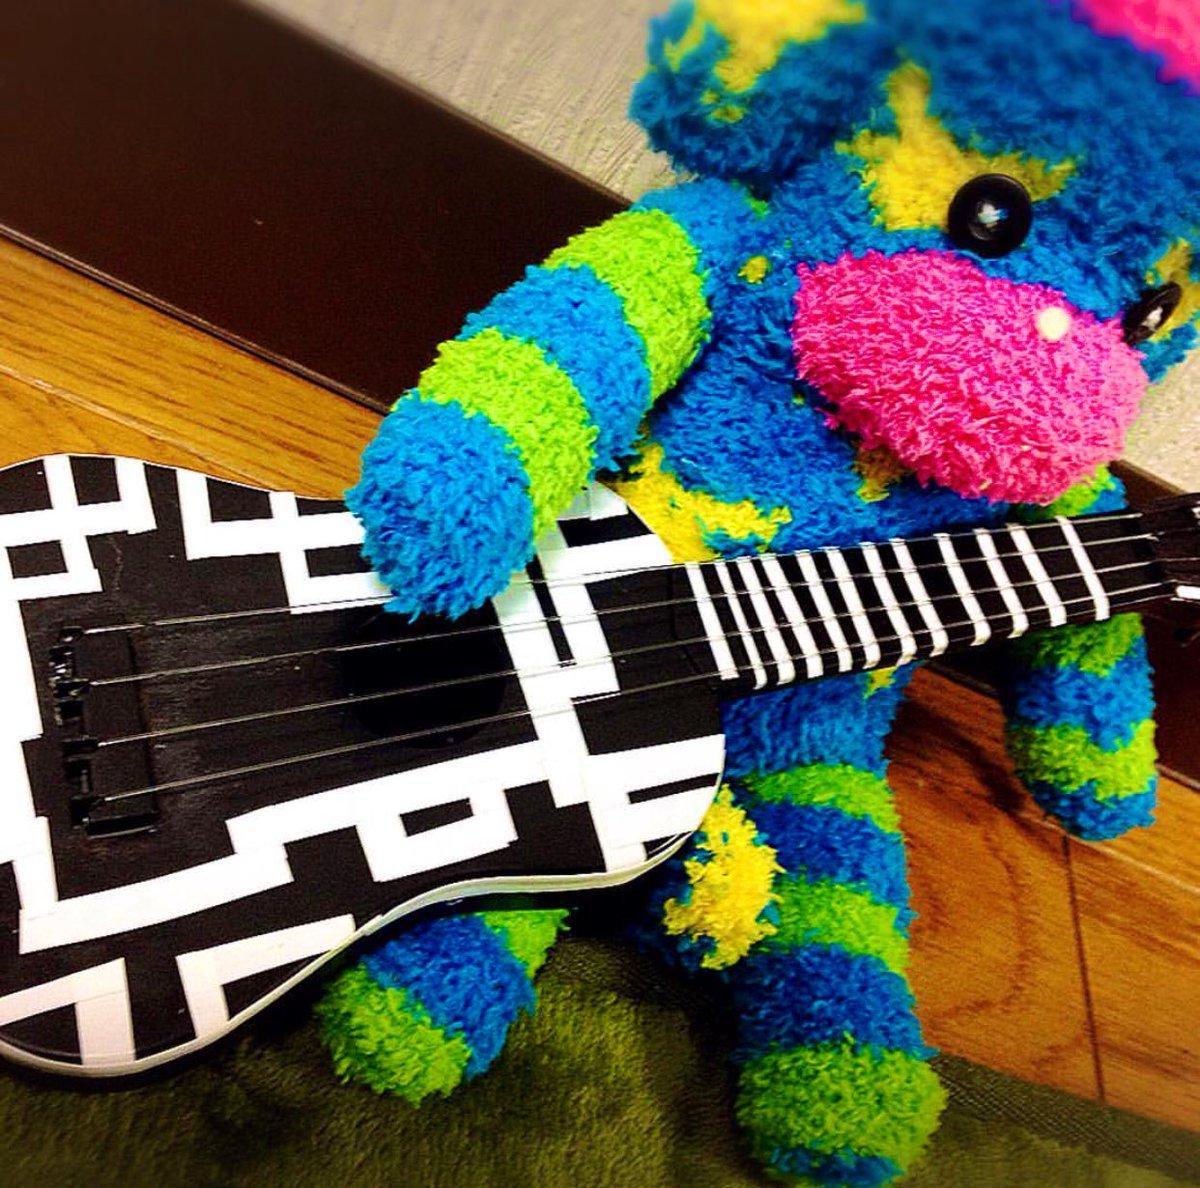 test ツイッターメディア - 100均一のギターを布袋ギターに 100均一の靴下を罹猿に  200円で出来ました  #リメイク #布袋寅泰  #100均一  #ソックモンキー  #ダイソー https://t.co/rbvdDynl4Z